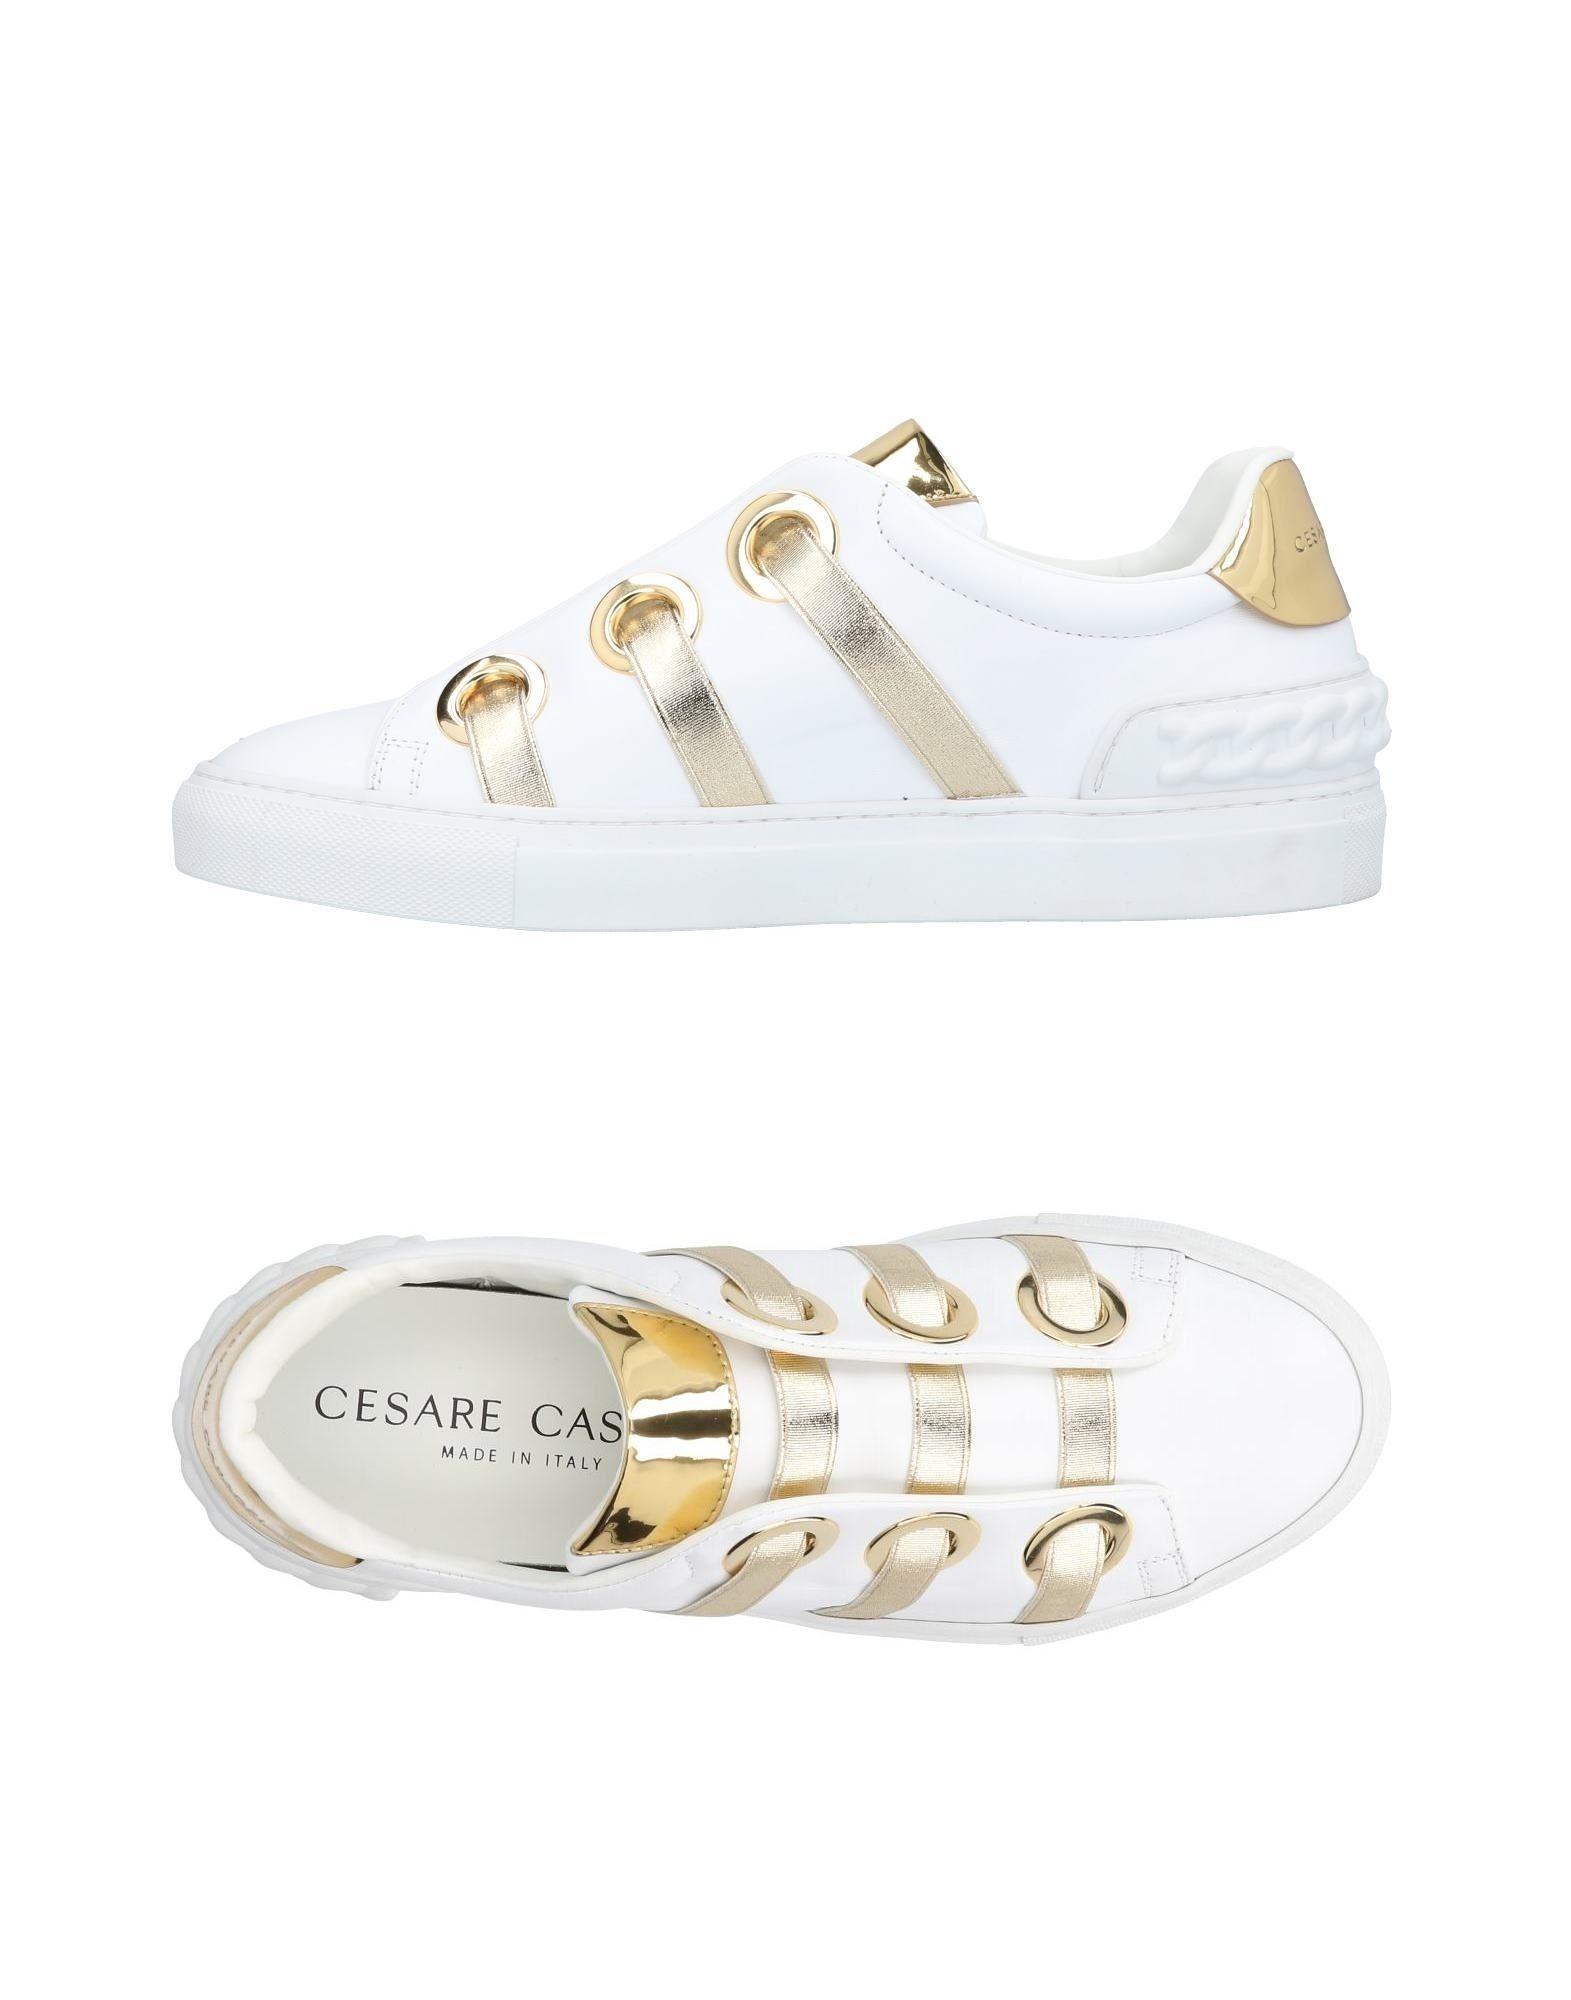 Cesare Casadei Sneakers Herren  11450870XQ Gute Qualität beliebte Schuhe